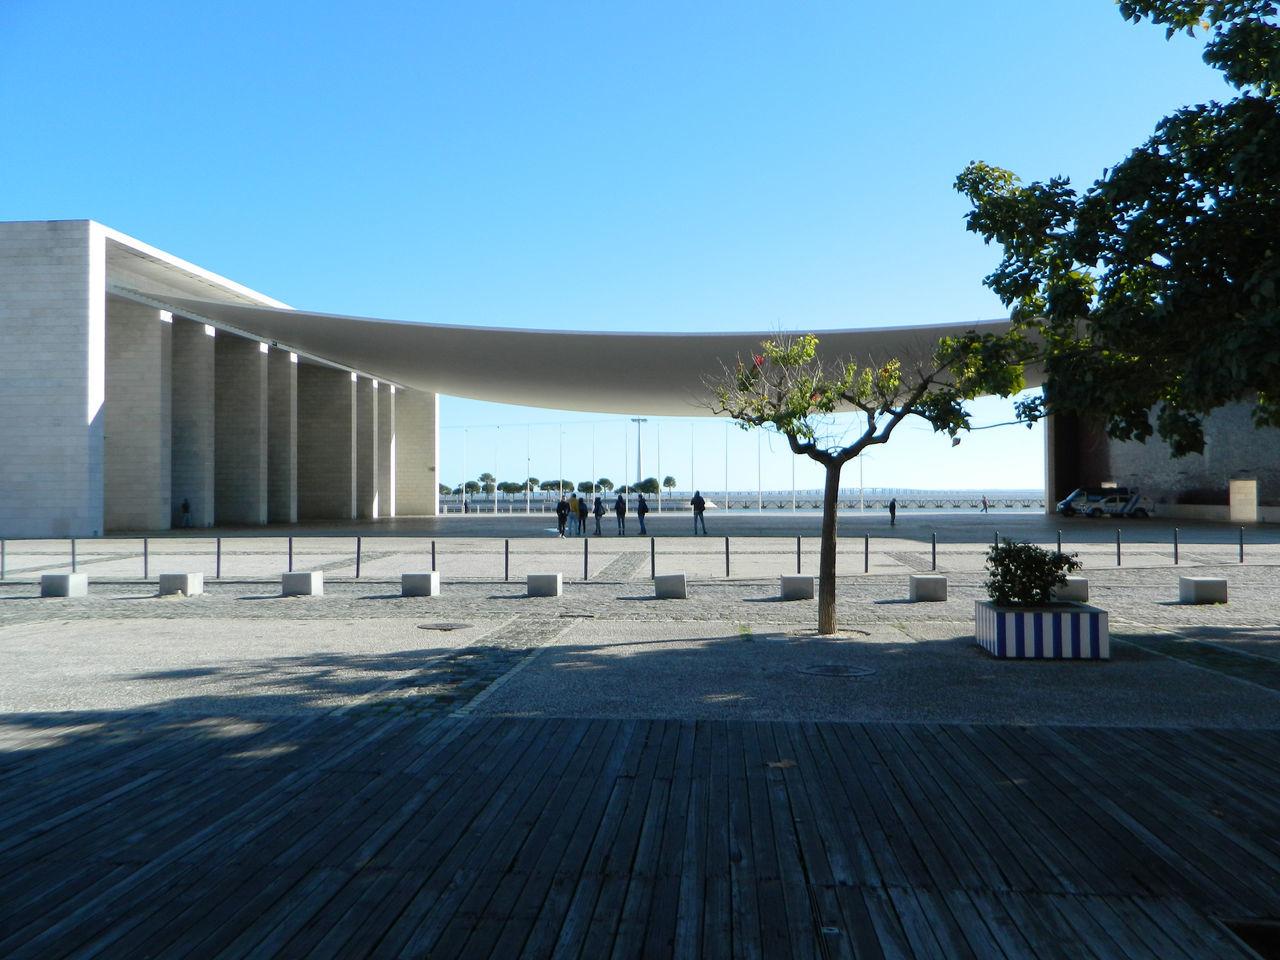 ExpoLisbonLisbonaPortugalSizaTravelTraveling Travel Photography Architecture Building ExteriorPerspective Architecture_collection Architecturelovers Architectureporn Arch